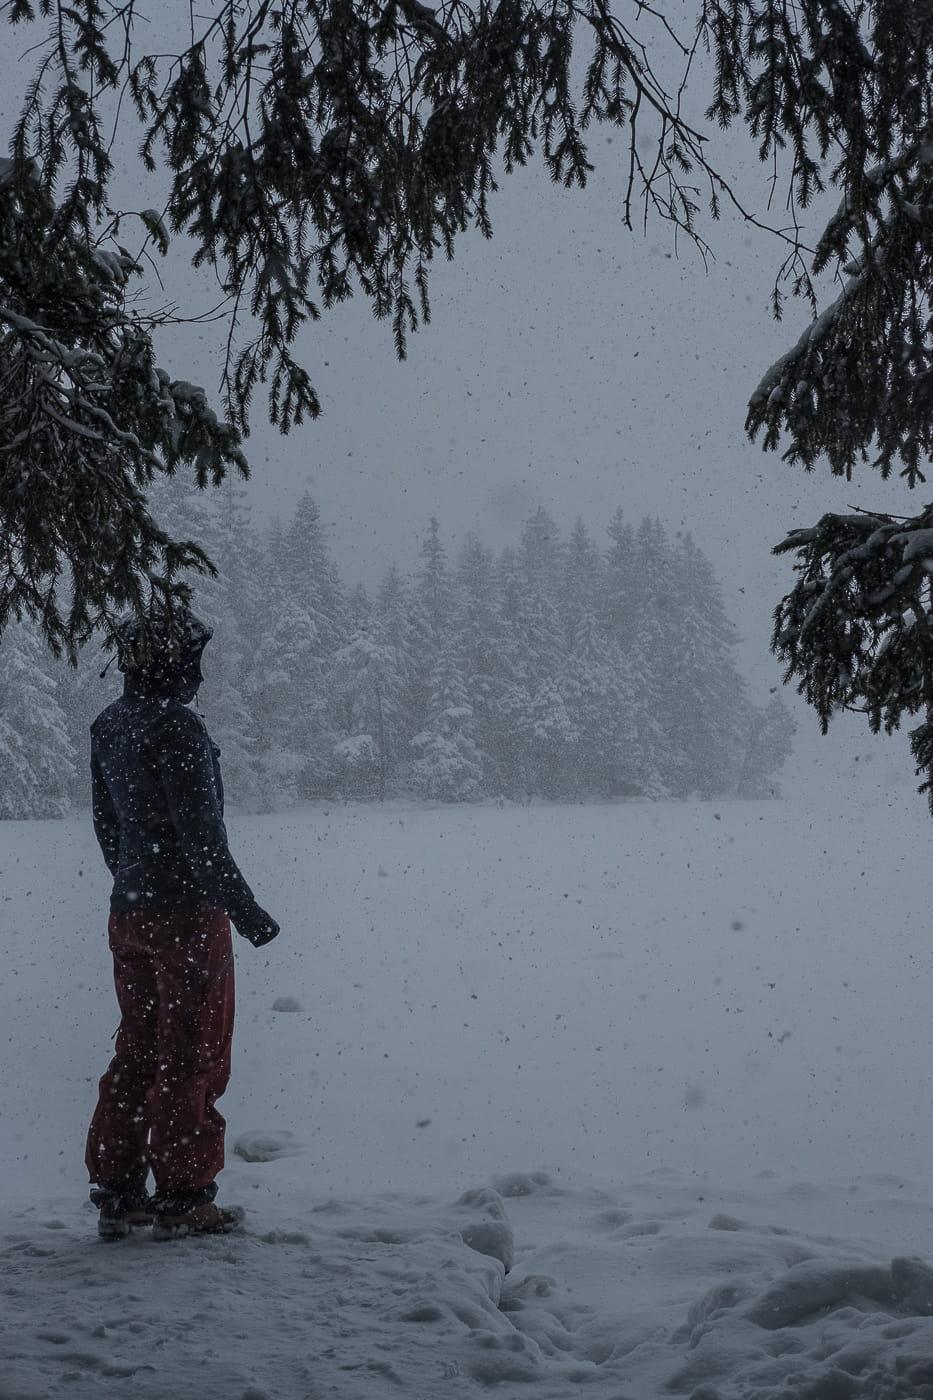 Am Ufer des Etang de la Gruere im Schnee